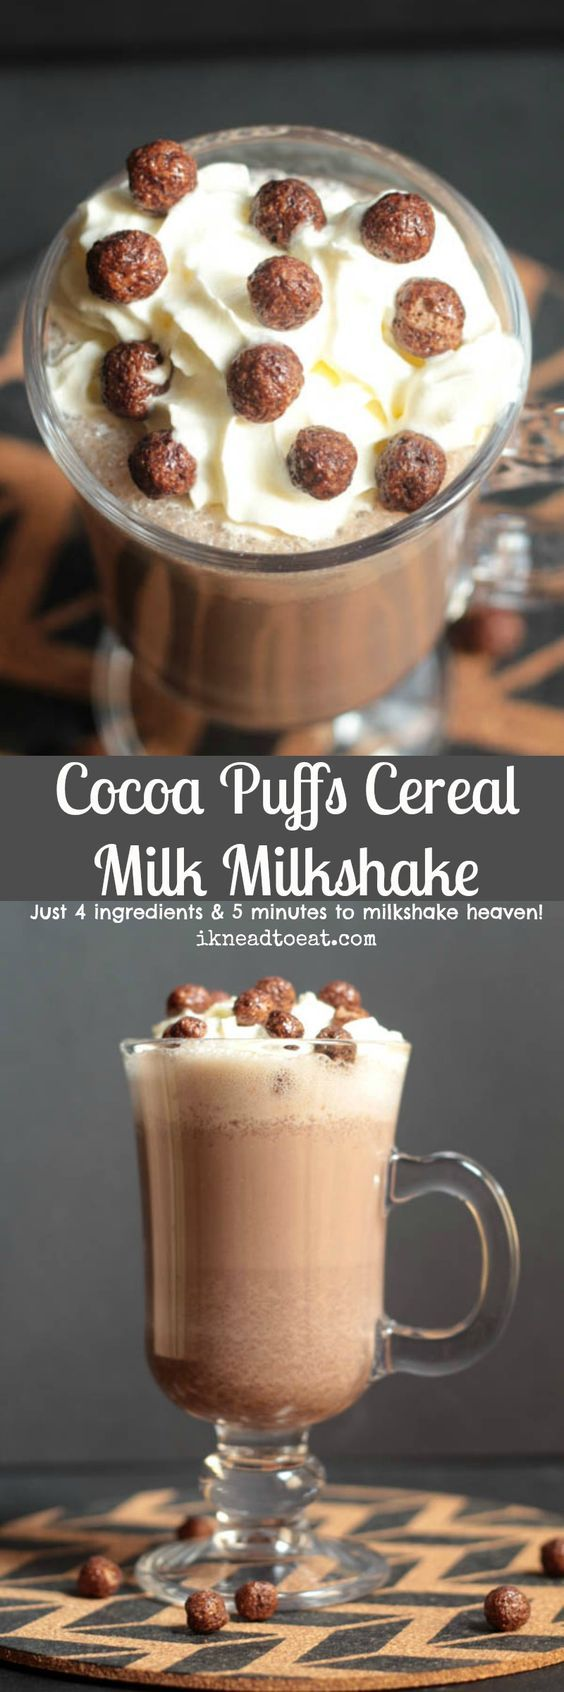 Cocoa Puffs Cereal Milk Milkshake